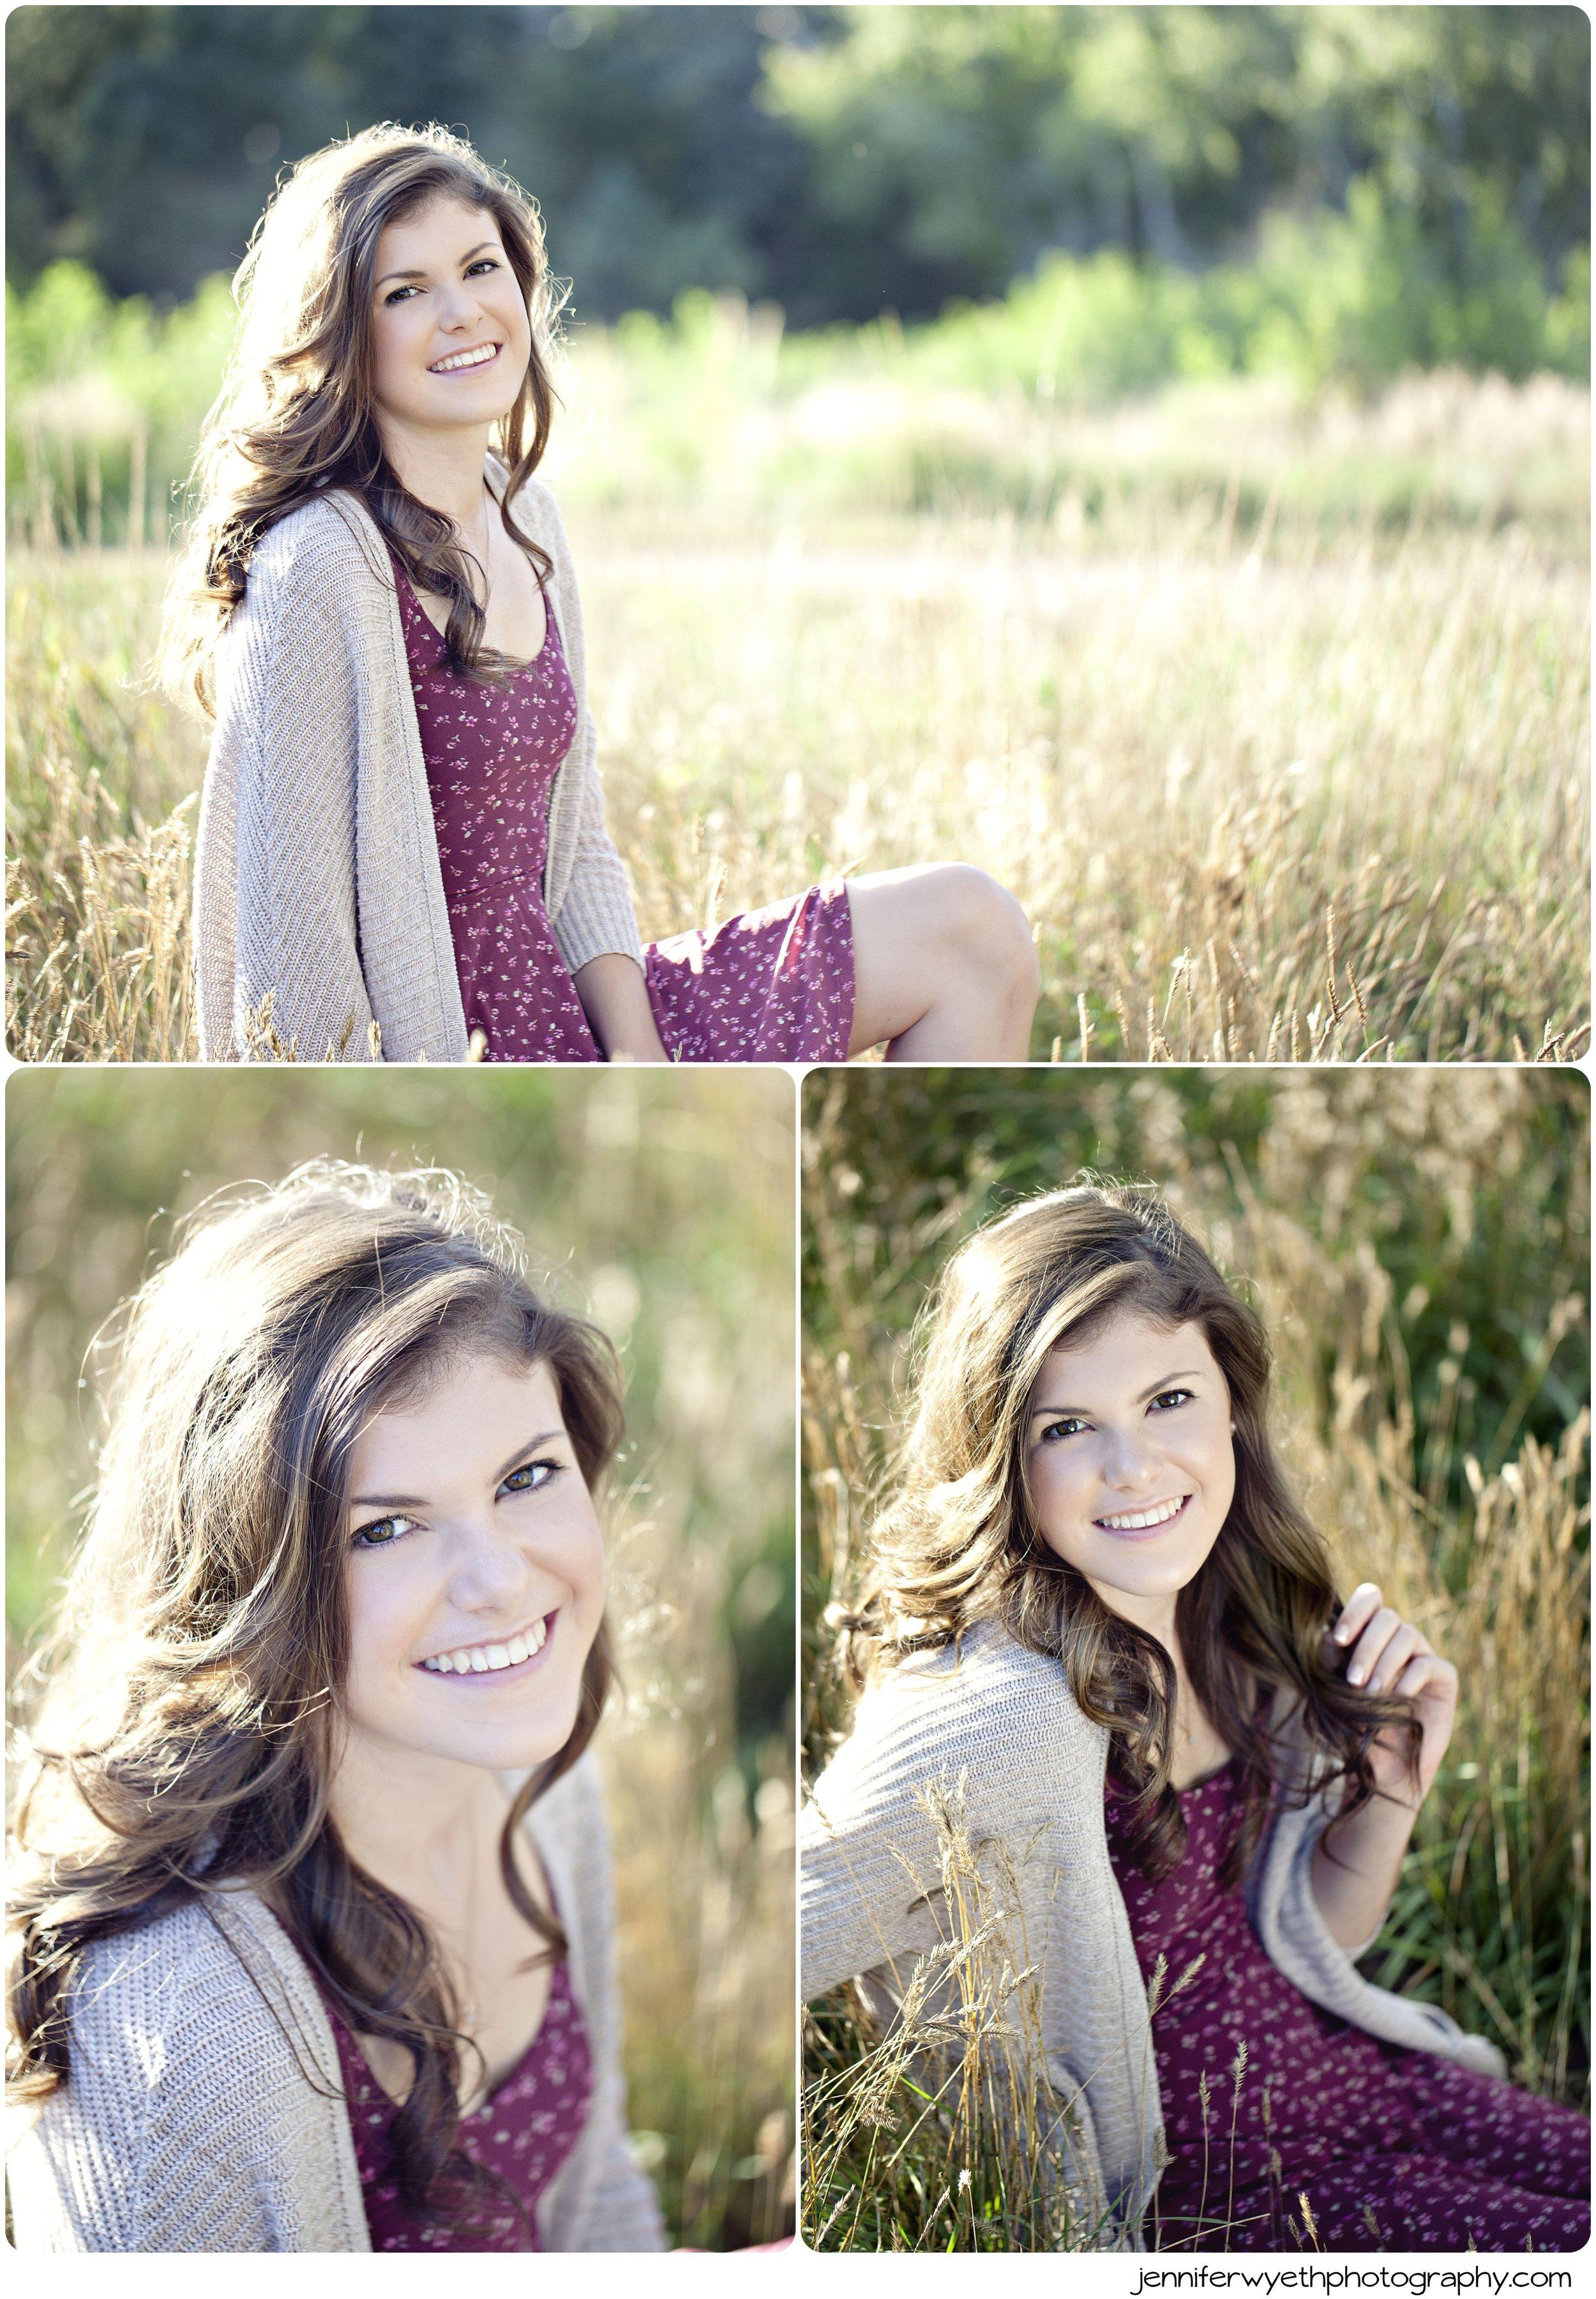 Wheat frames the dark locks of hair on gorgeous teen girl